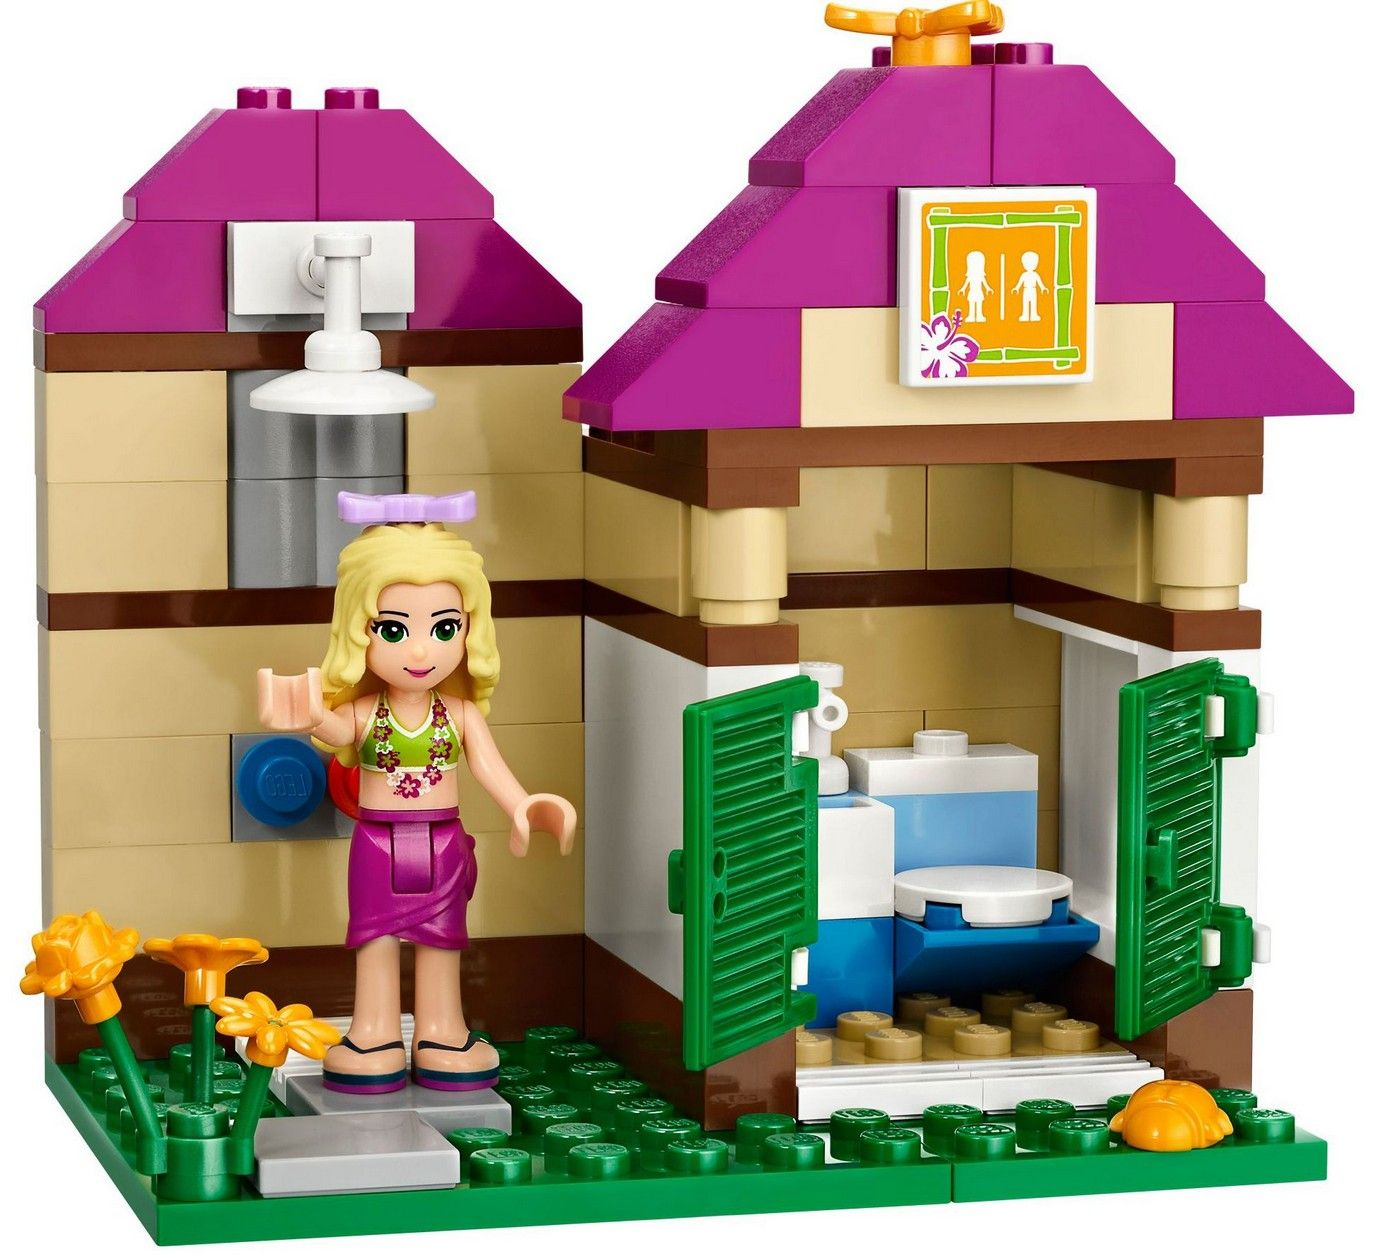 Lego 41008 Friends Heartlake City Pool I Brick City